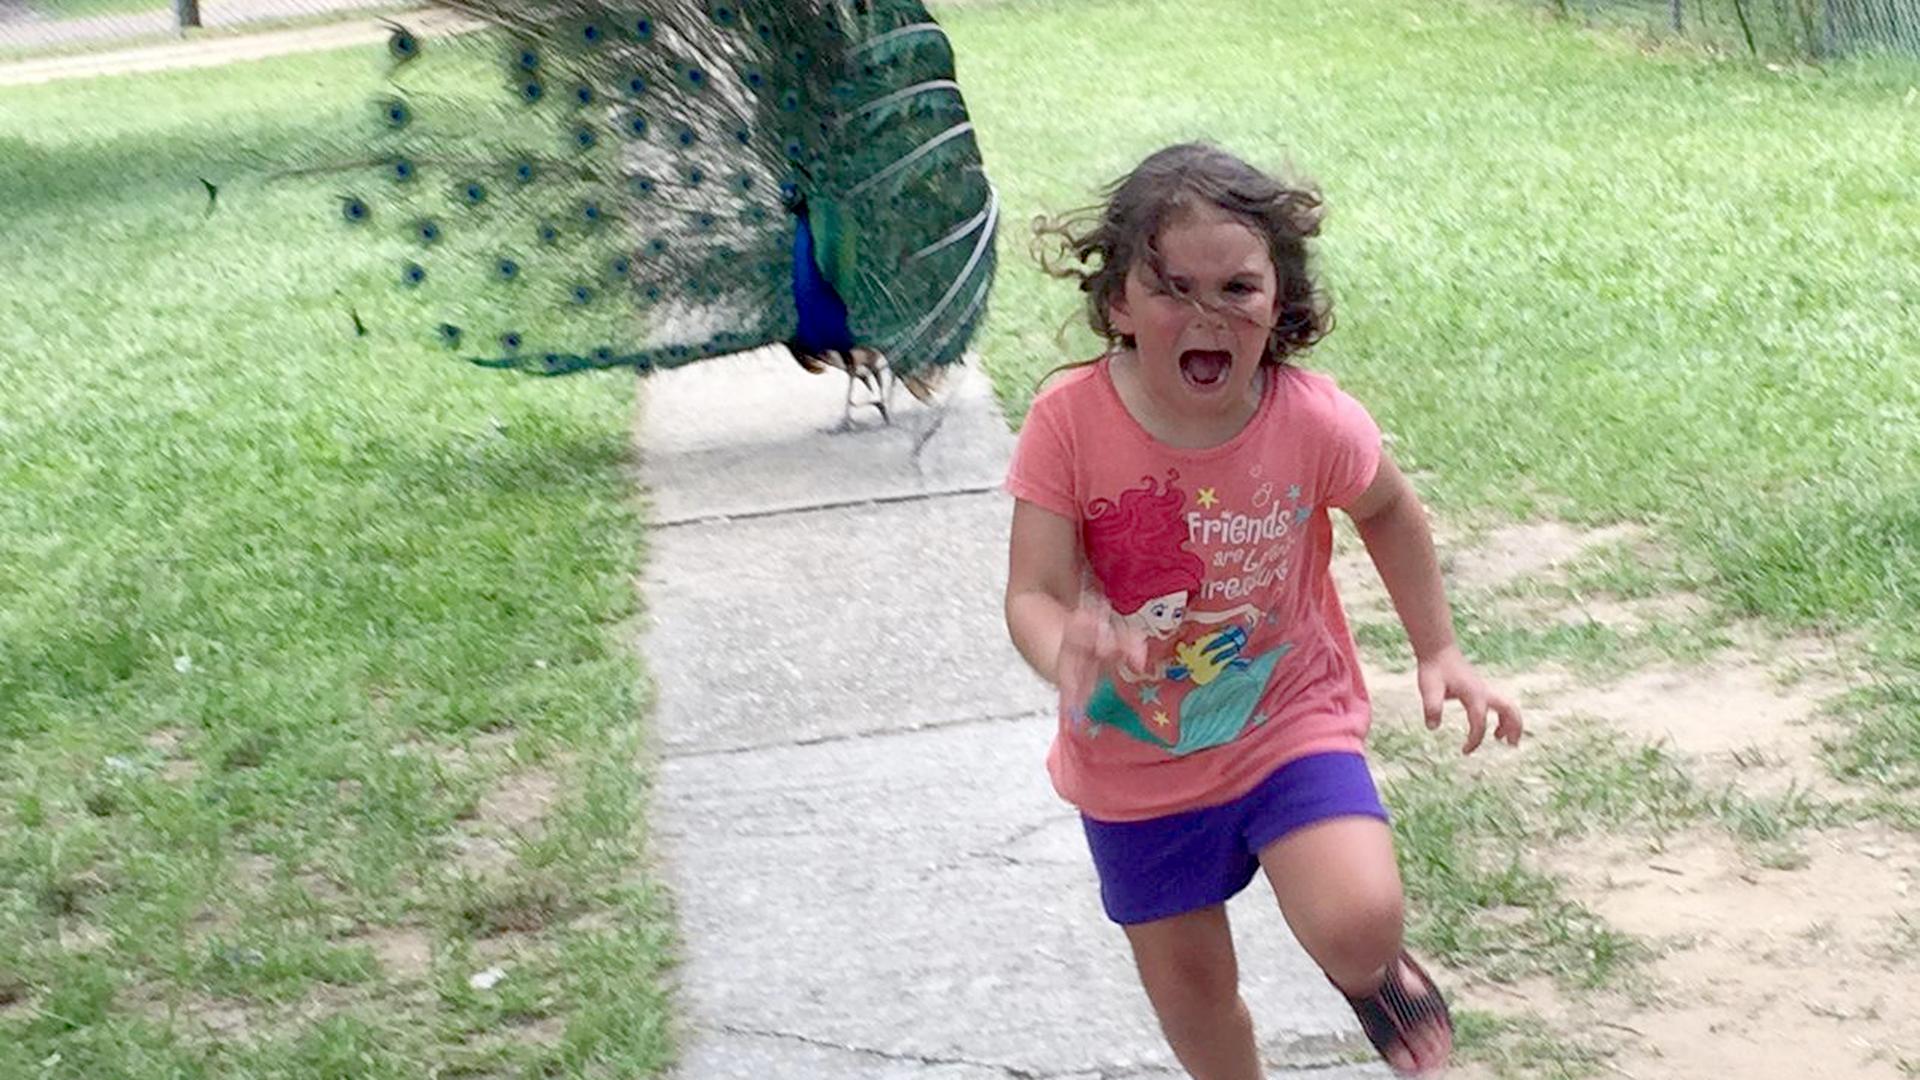 Run! Internet has fun ...